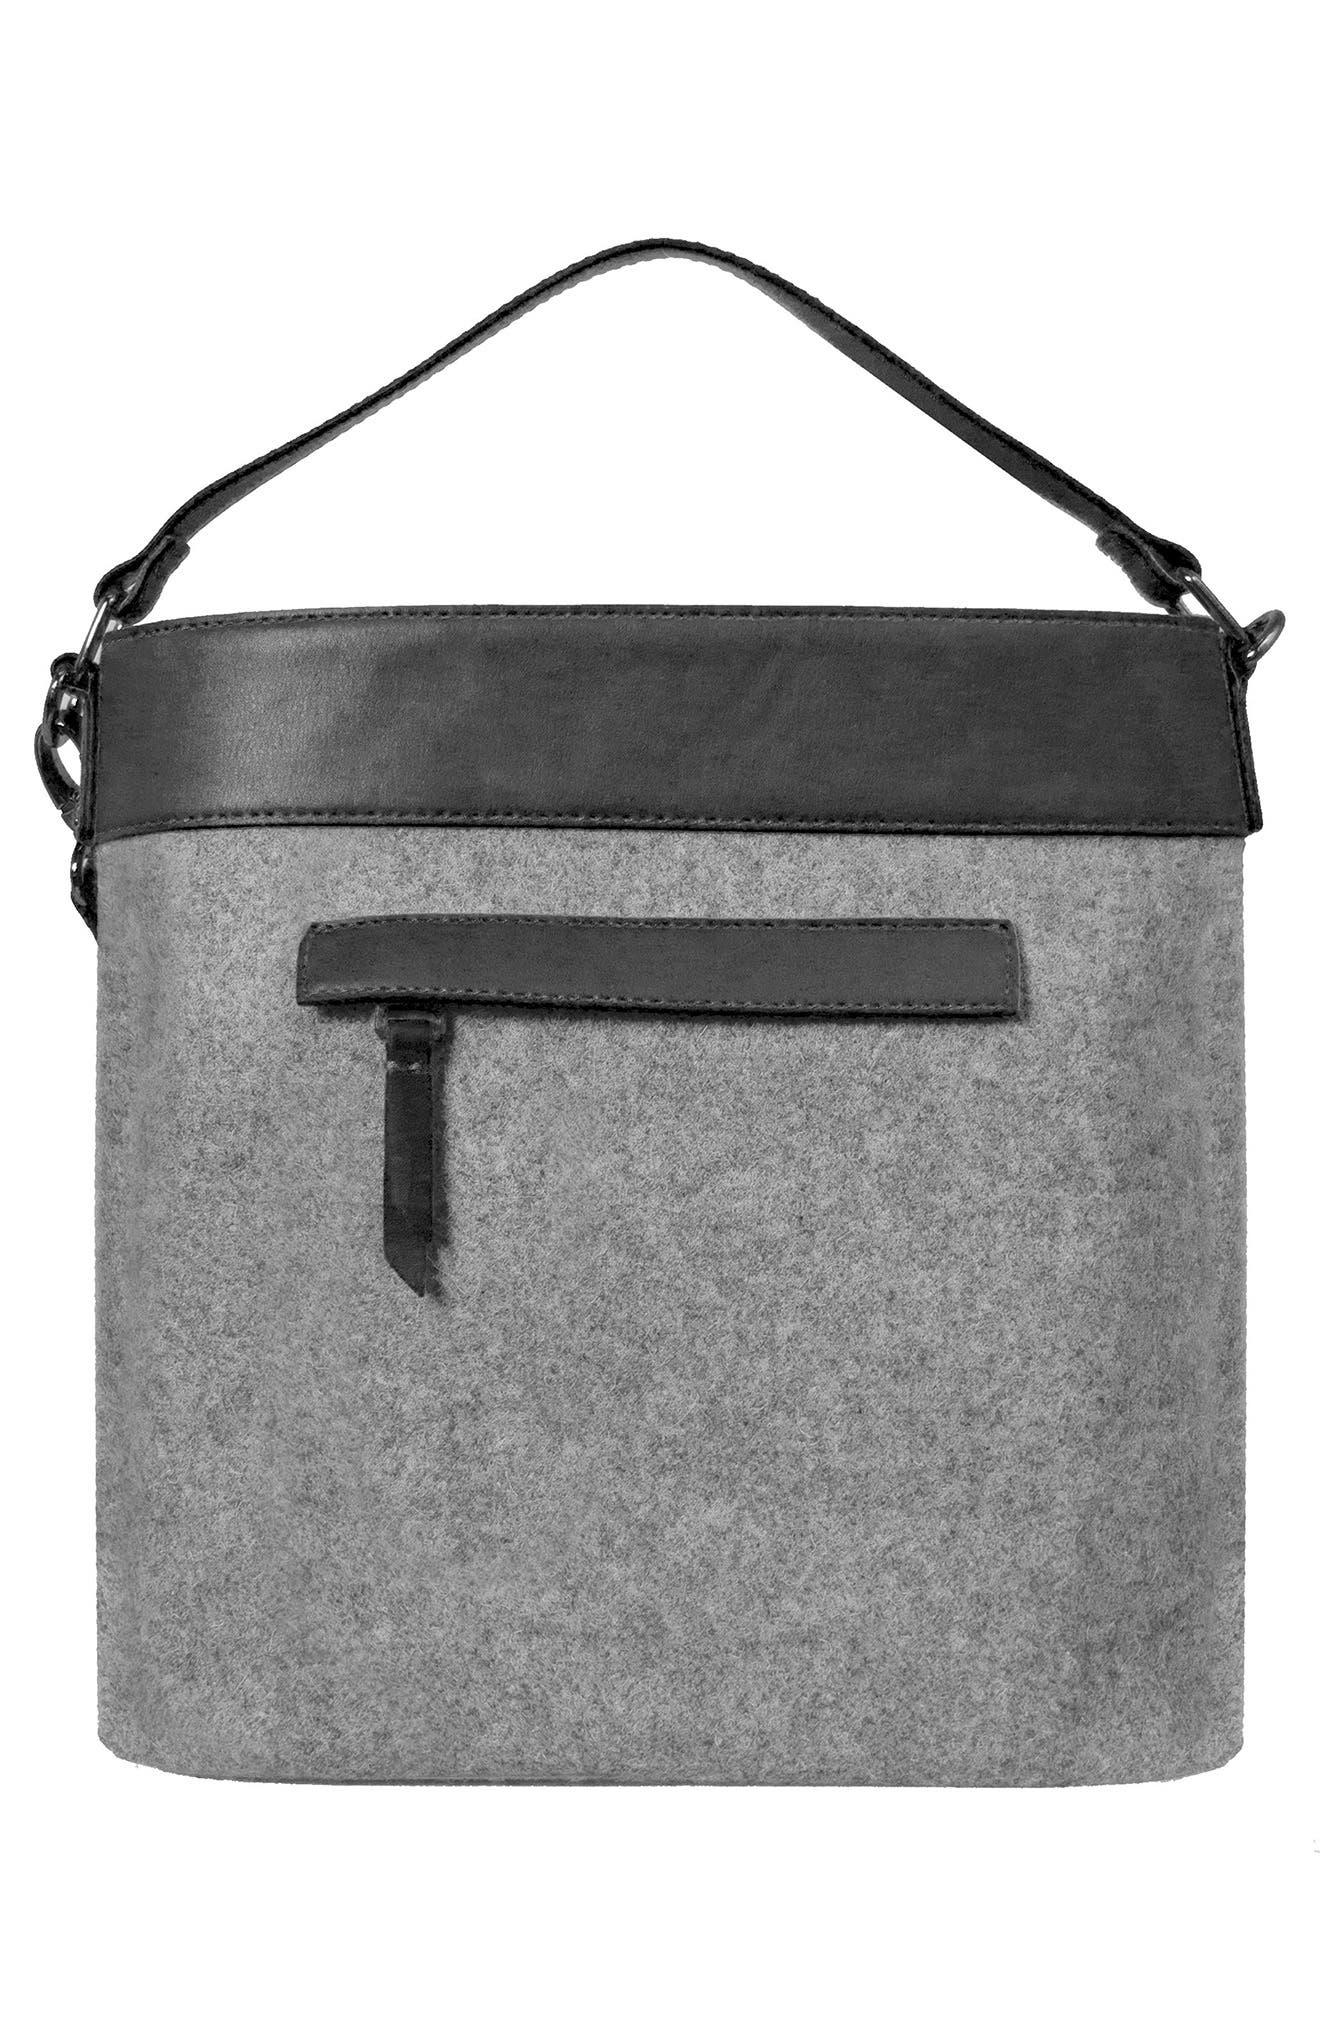 Boheme Wool & Leather Convertible Crossbody Bag,                             Alternate thumbnail 2, color,                             Slate